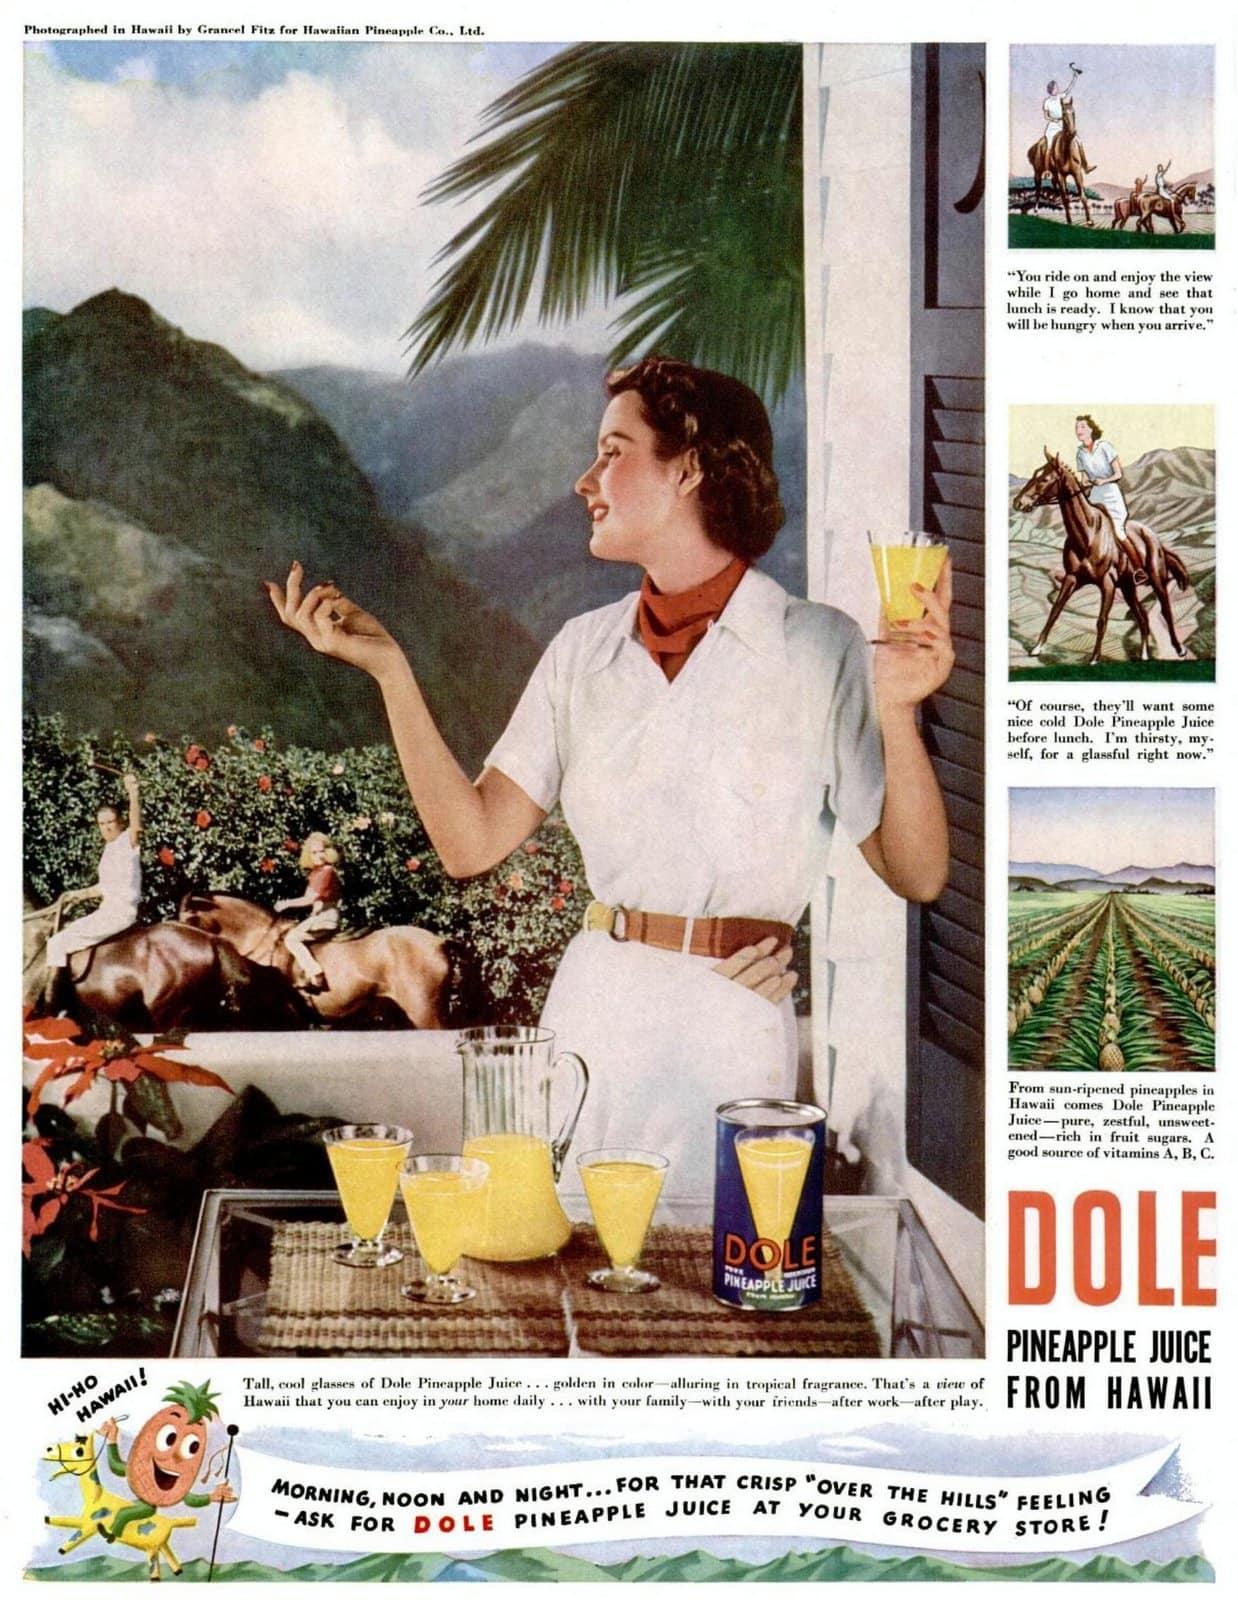 Dole pineapple juice from Hawaii (1939)